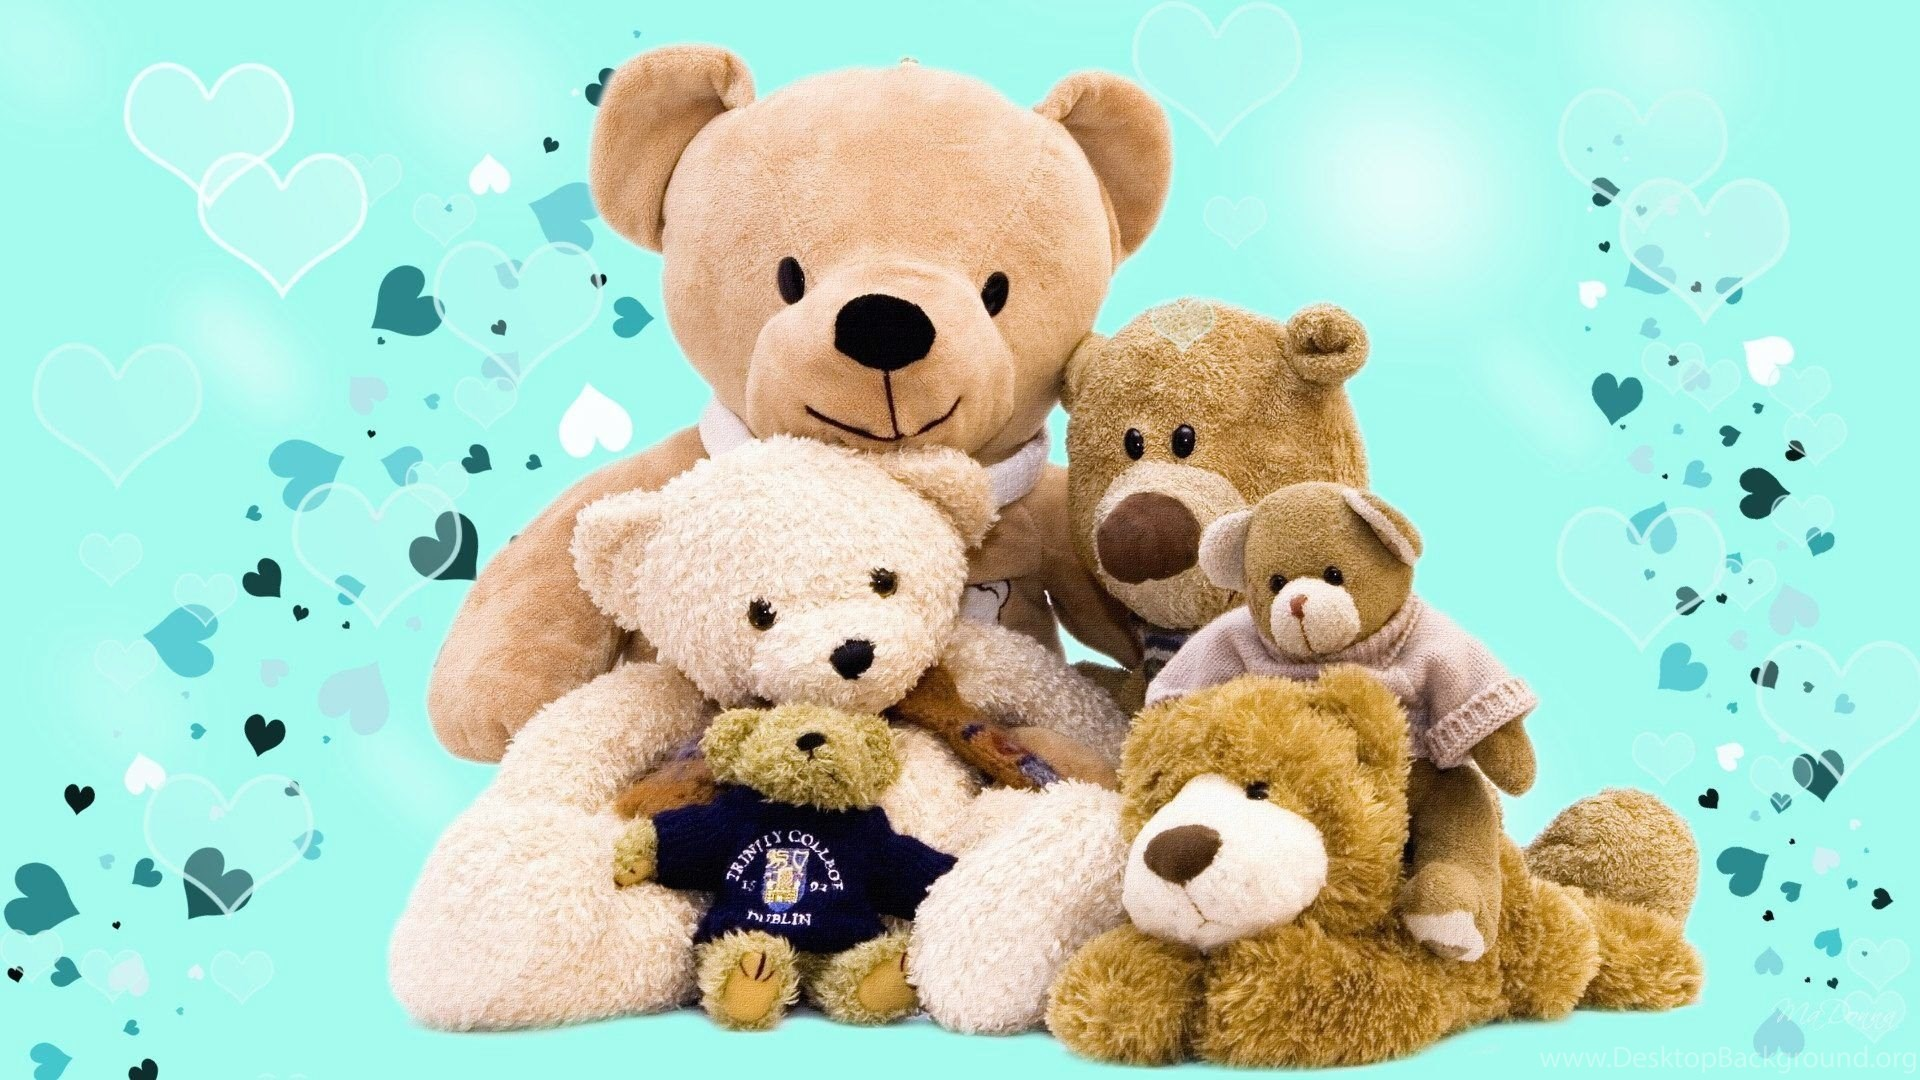 Teddy bear wallpapers hd cutewallpaper desktop background popular thecheapjerseys Image collections